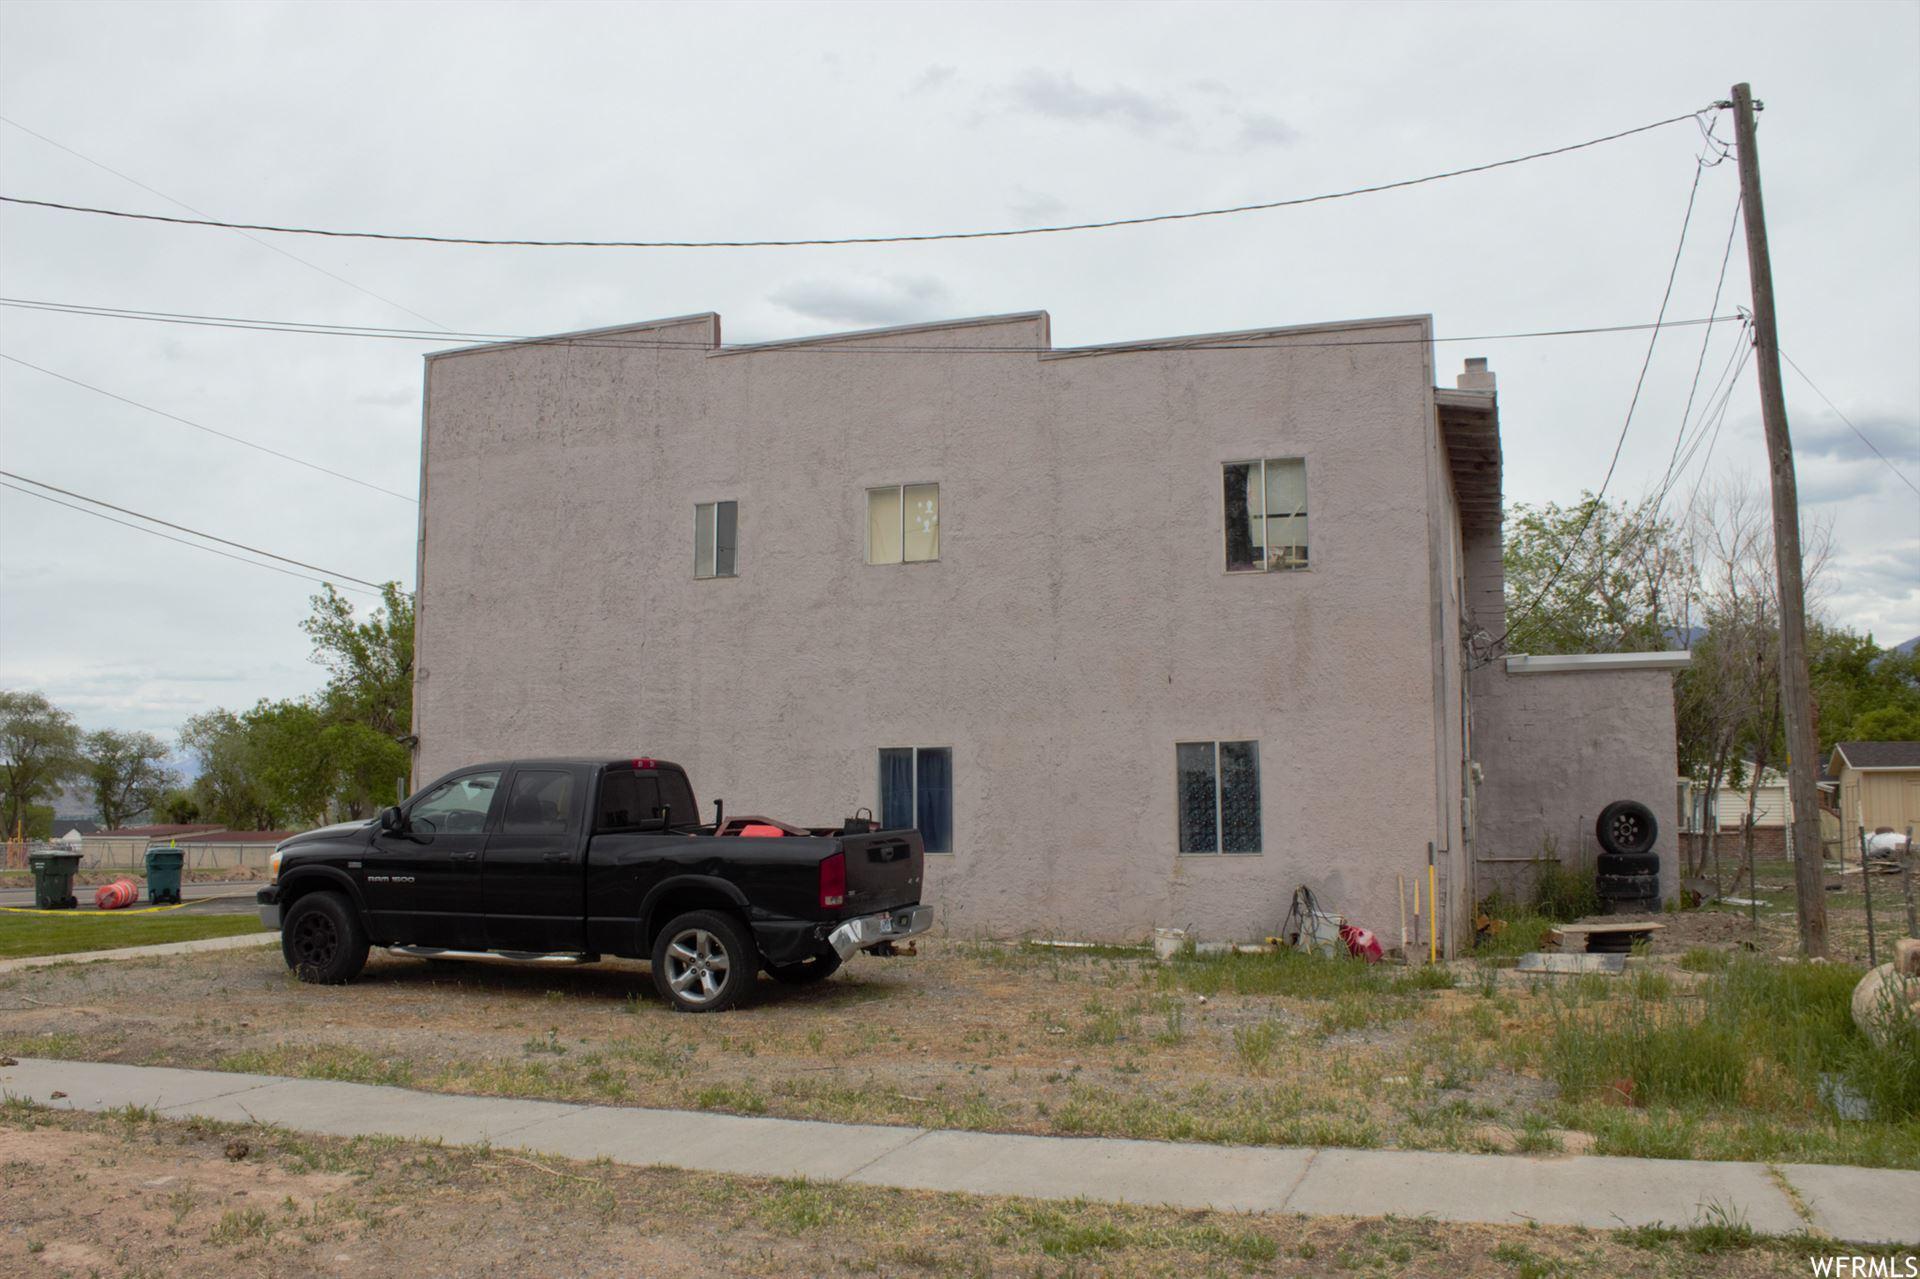 Photo of 14 E MAIN ST, Goshen, UT 84633 (MLS # 1744663)